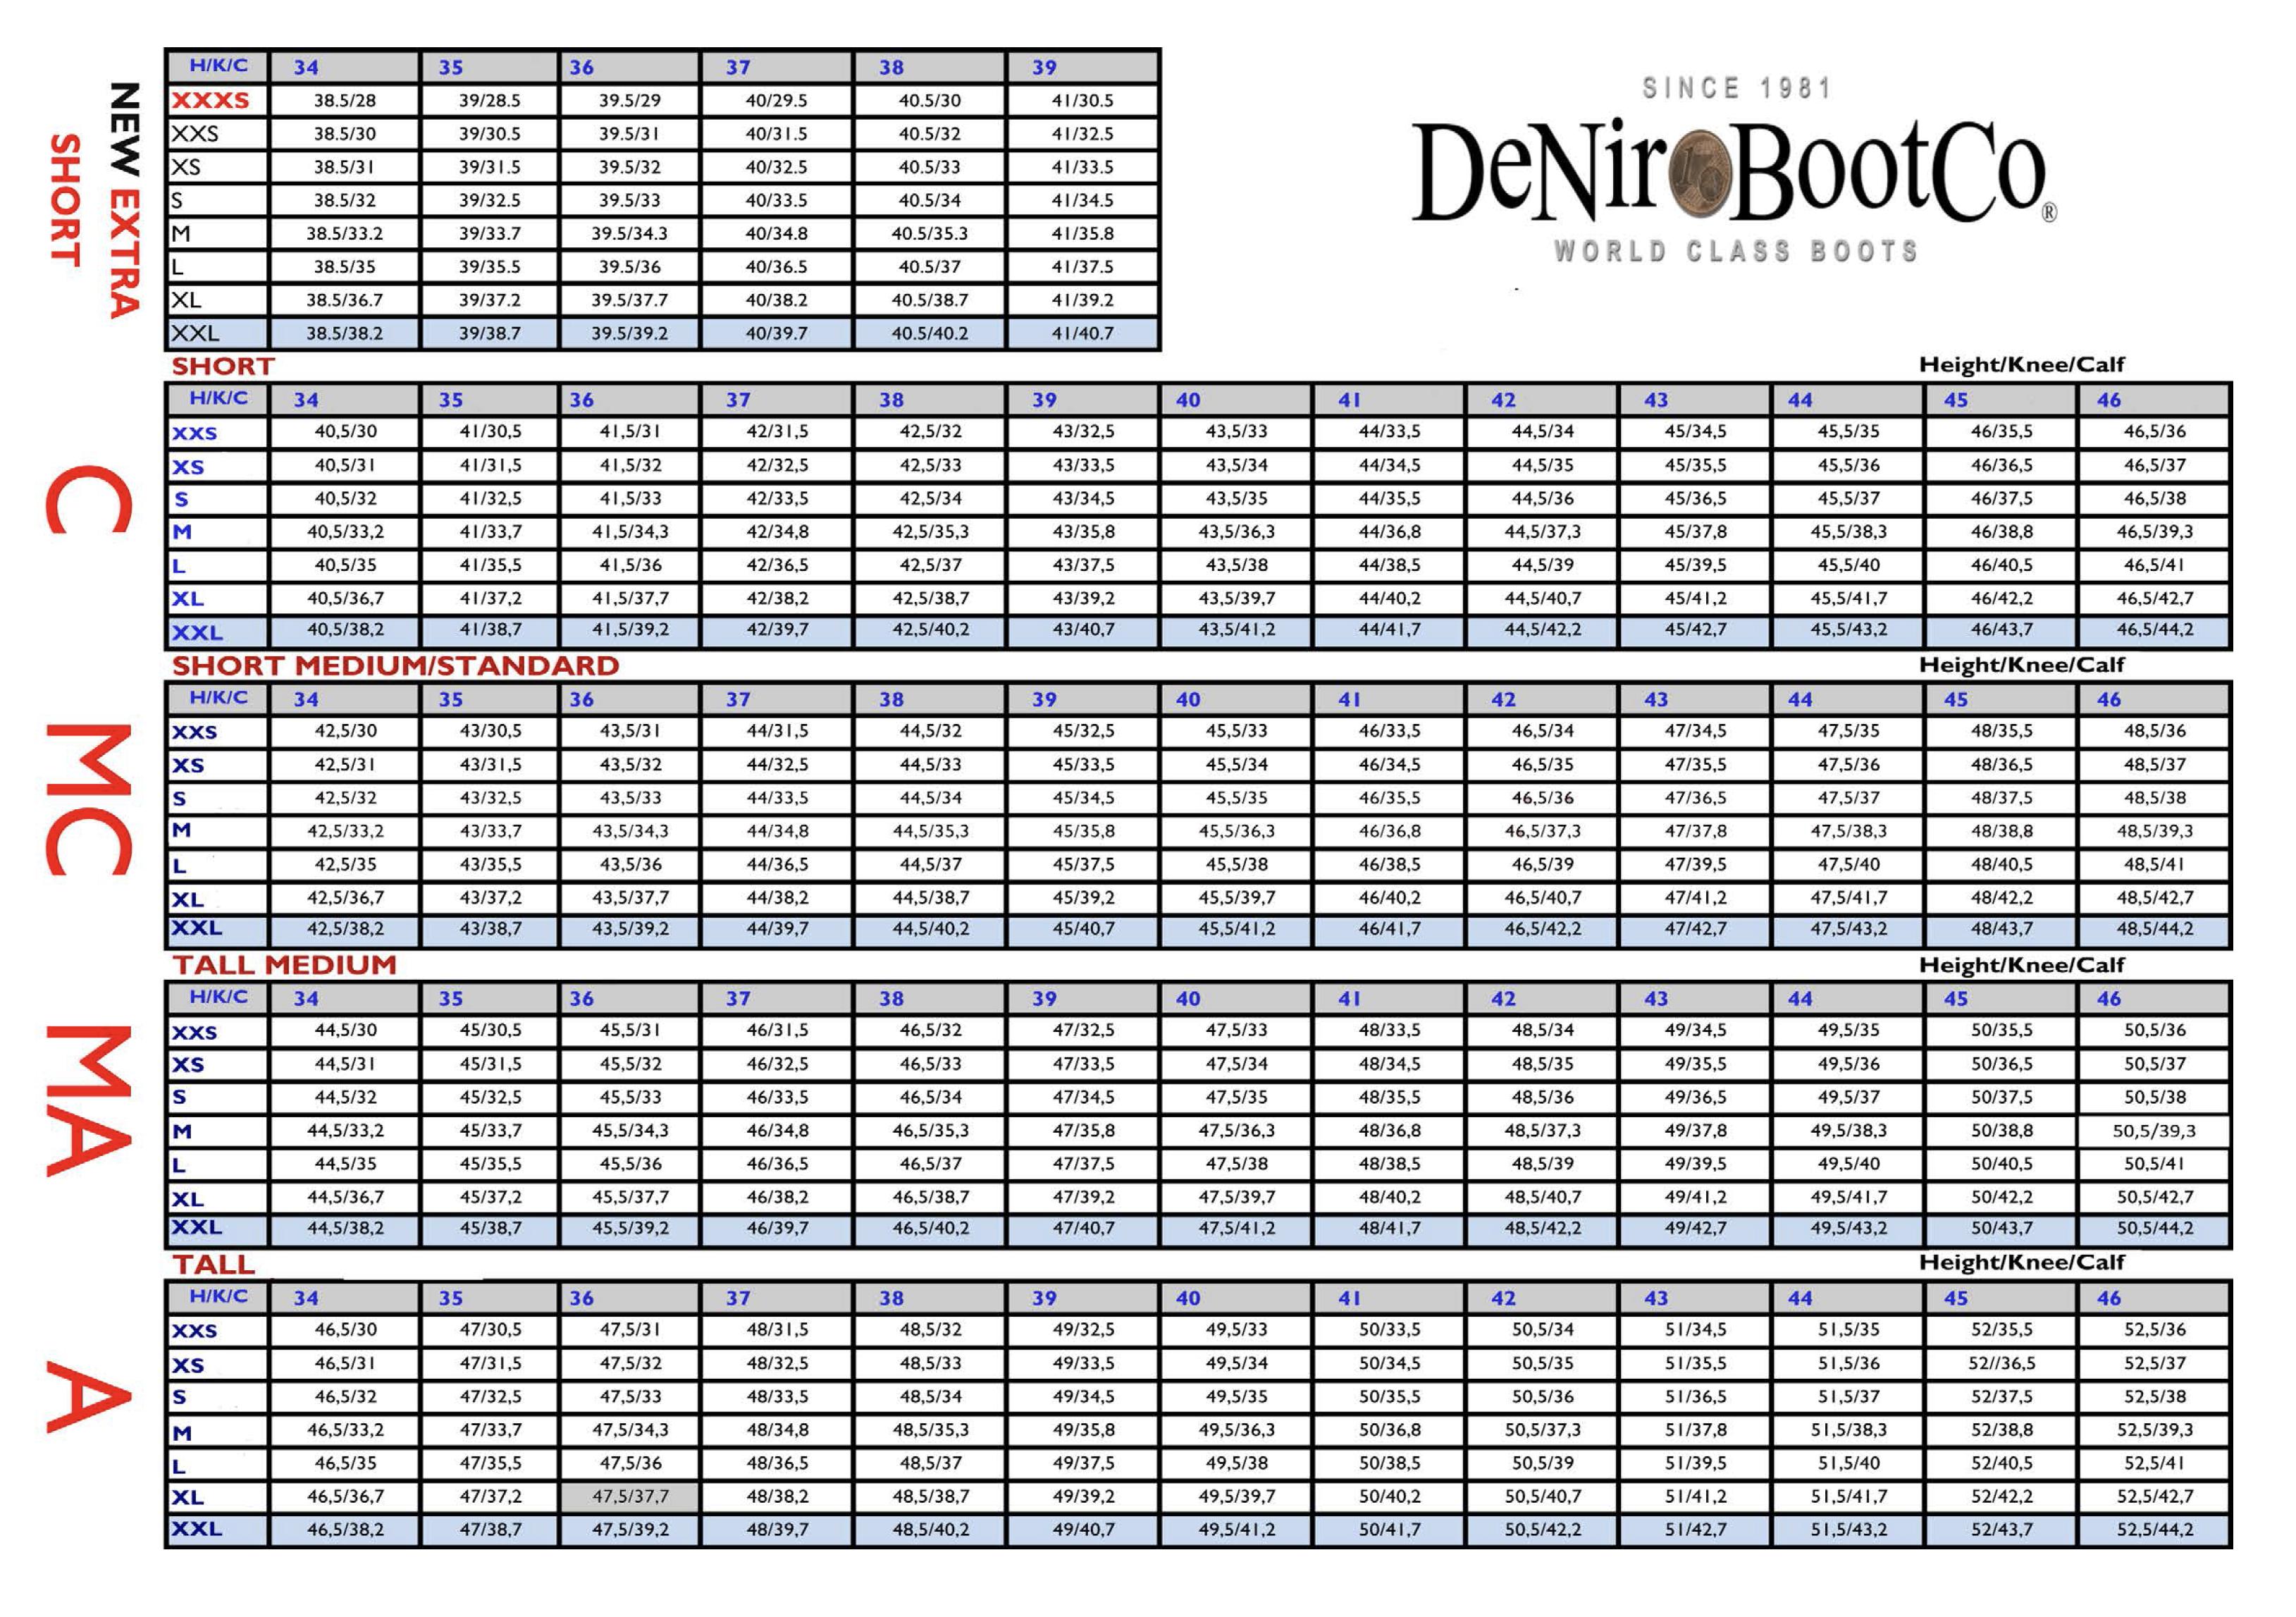 deniro-boot-co-off-the-shelf-measurement.png